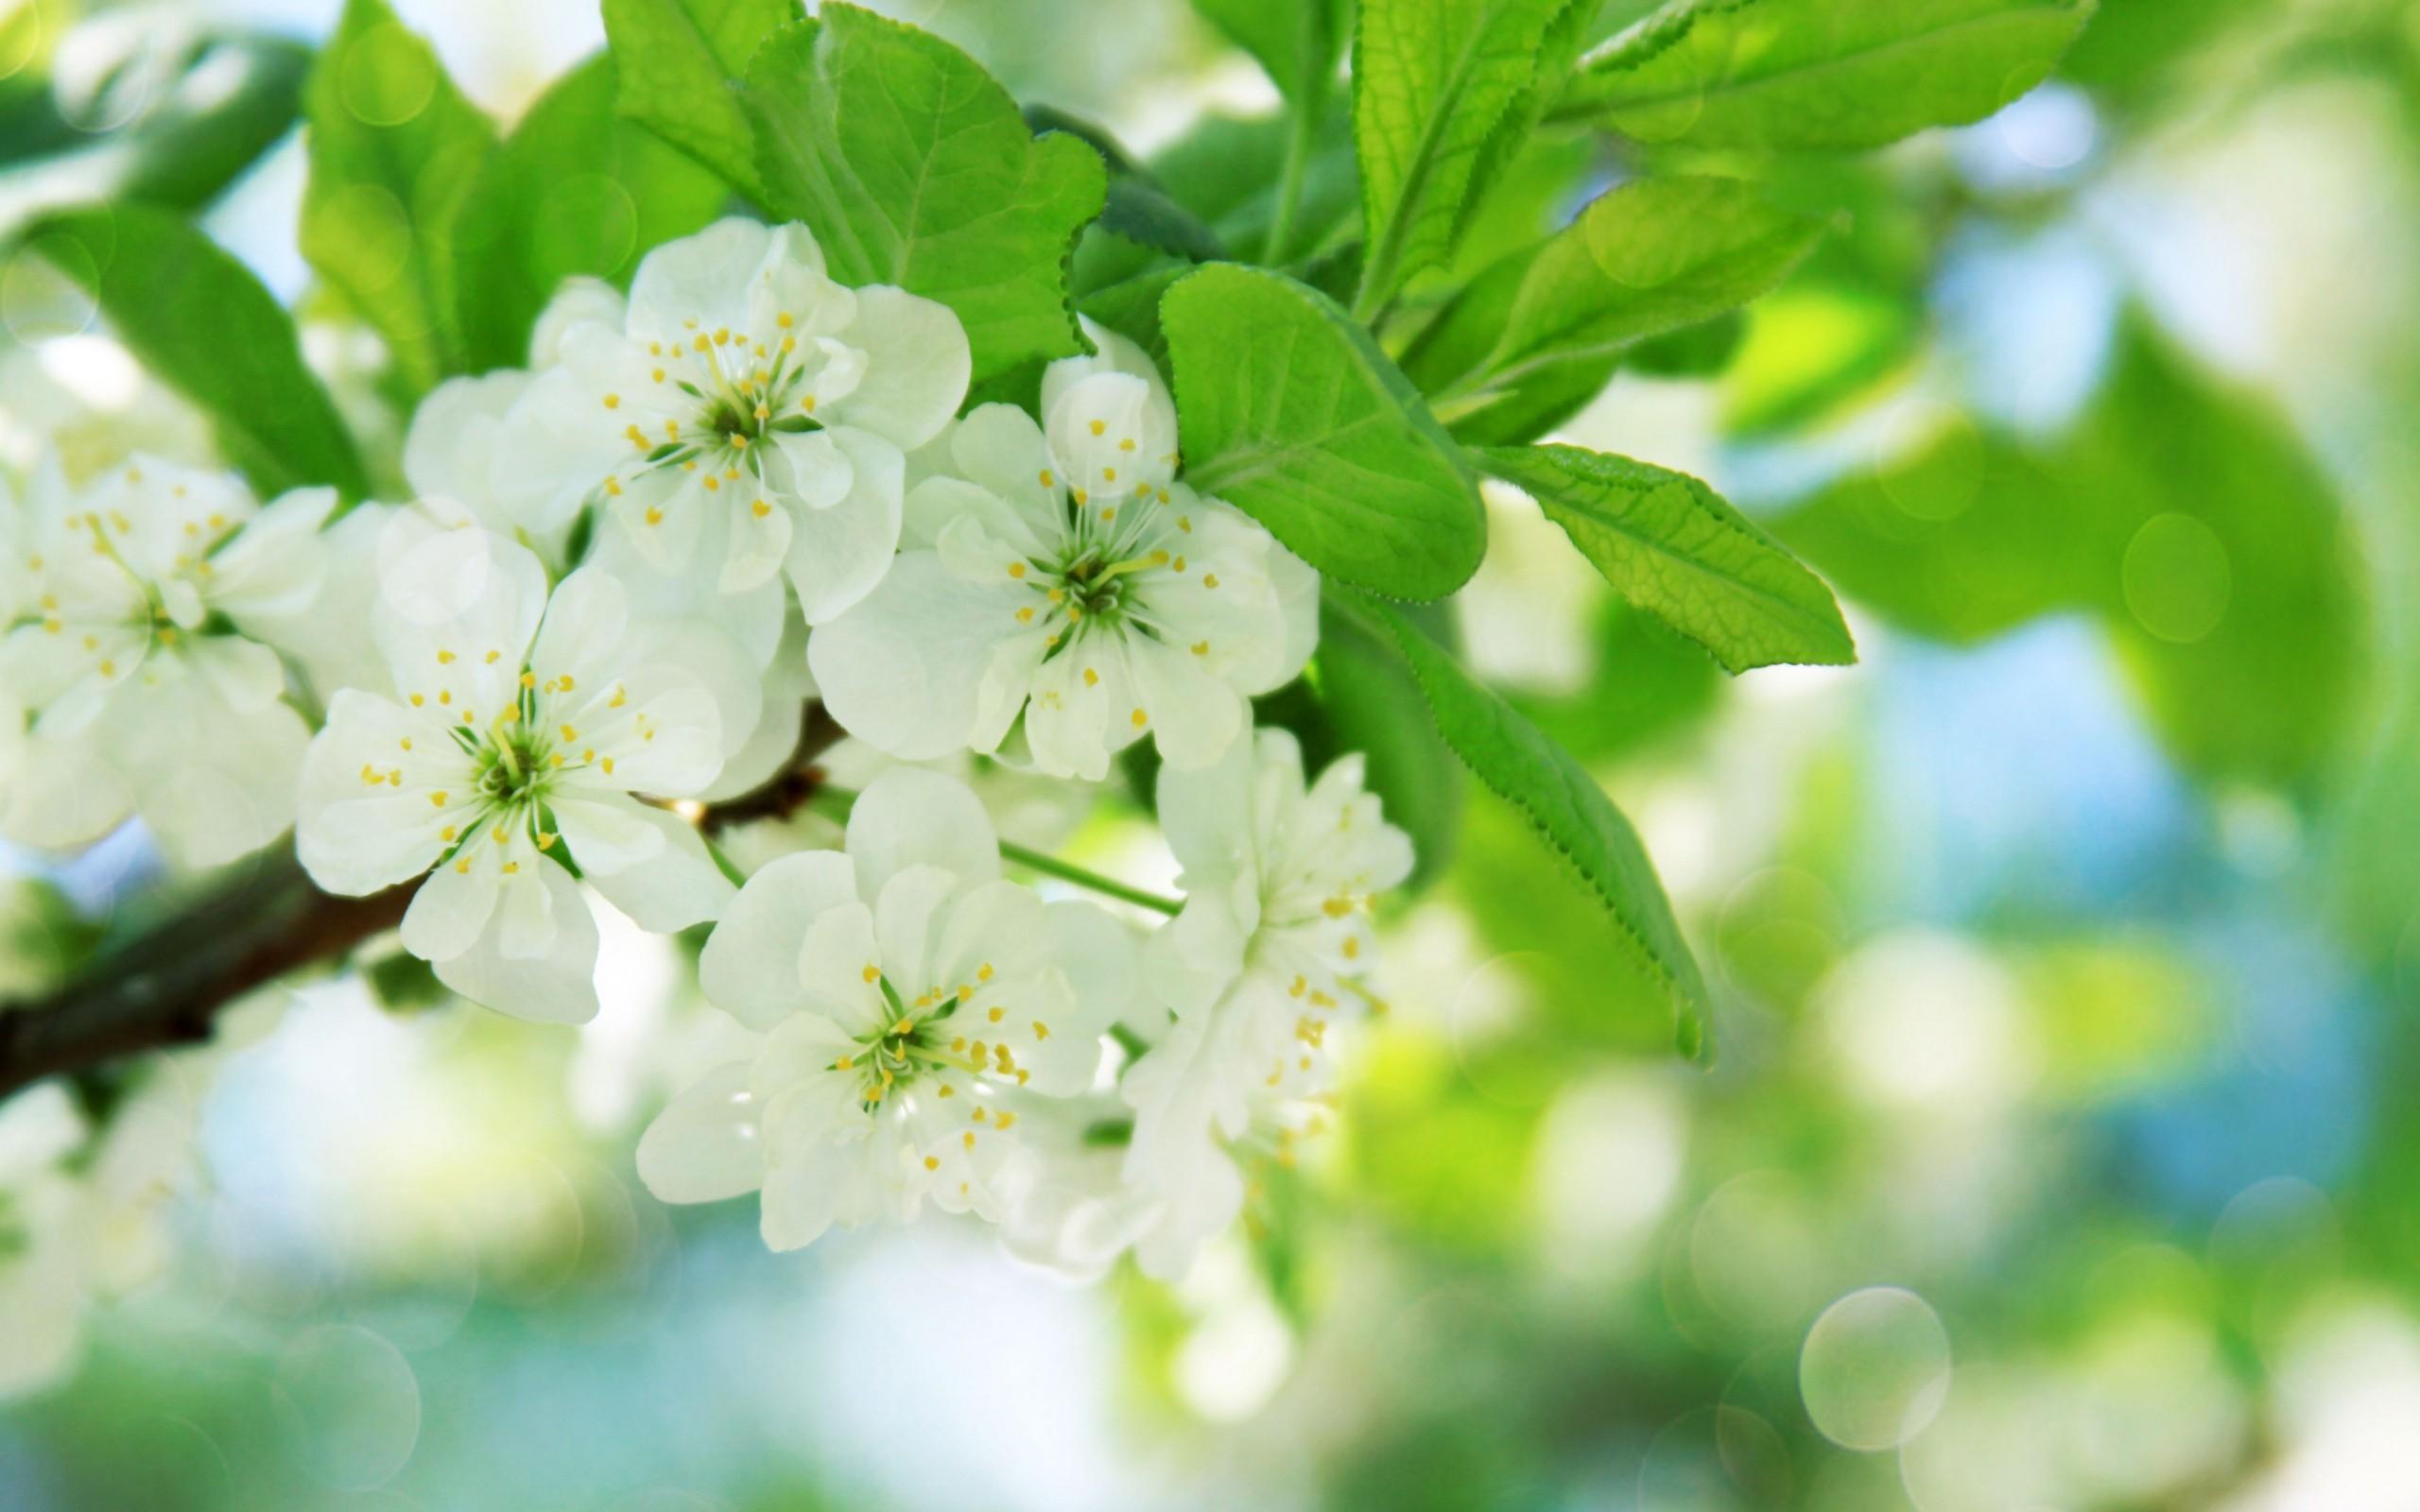 Res: 2560x1600, Pear tree flowers wallpaper